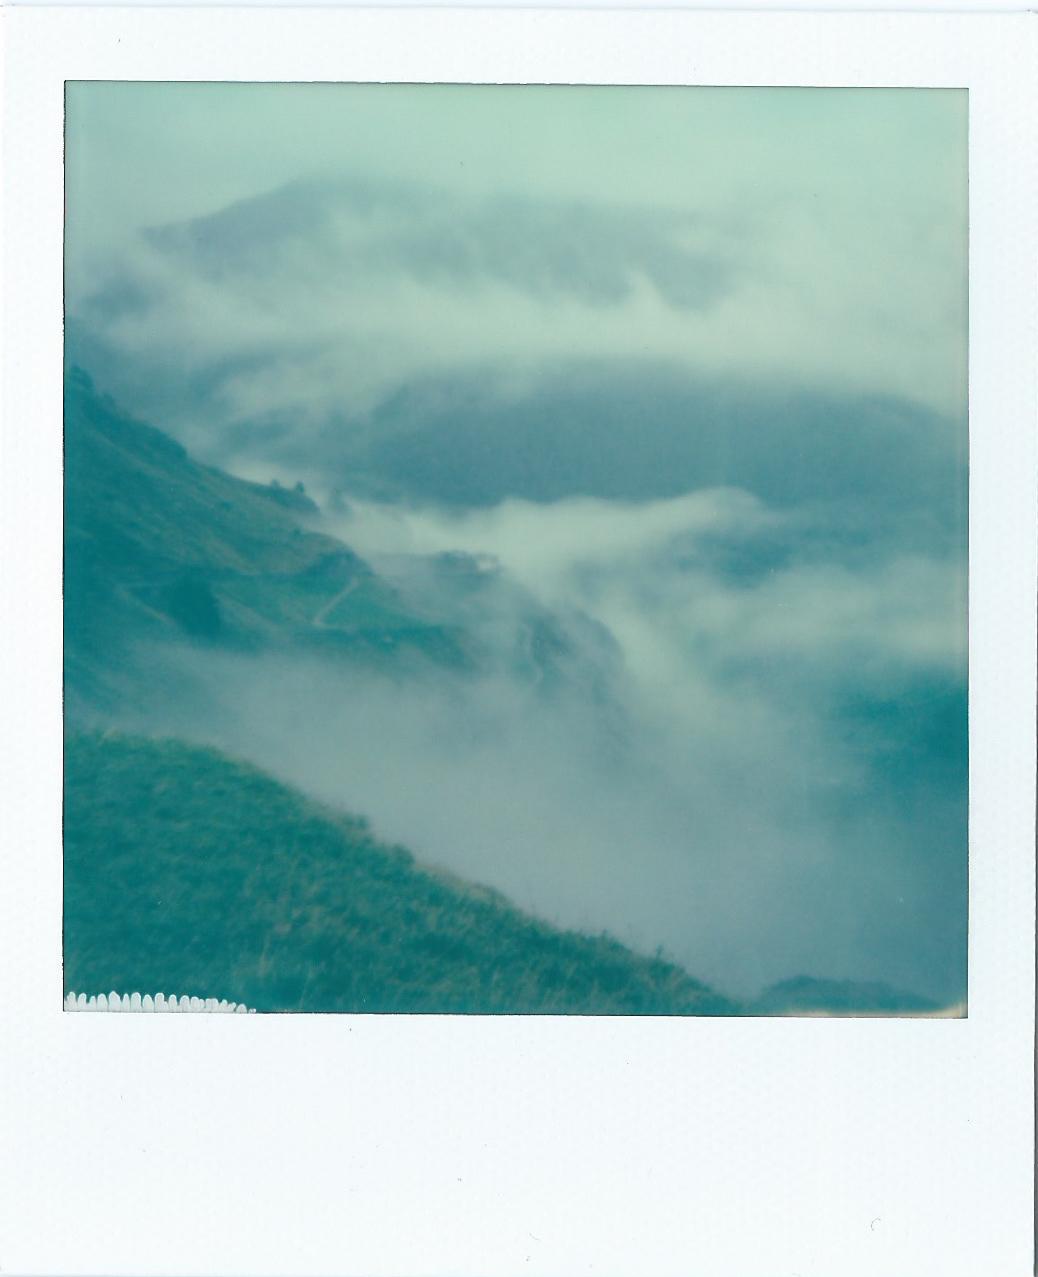 Fog | I-1 | Impossible Color 3.0 | Ainu Lindale